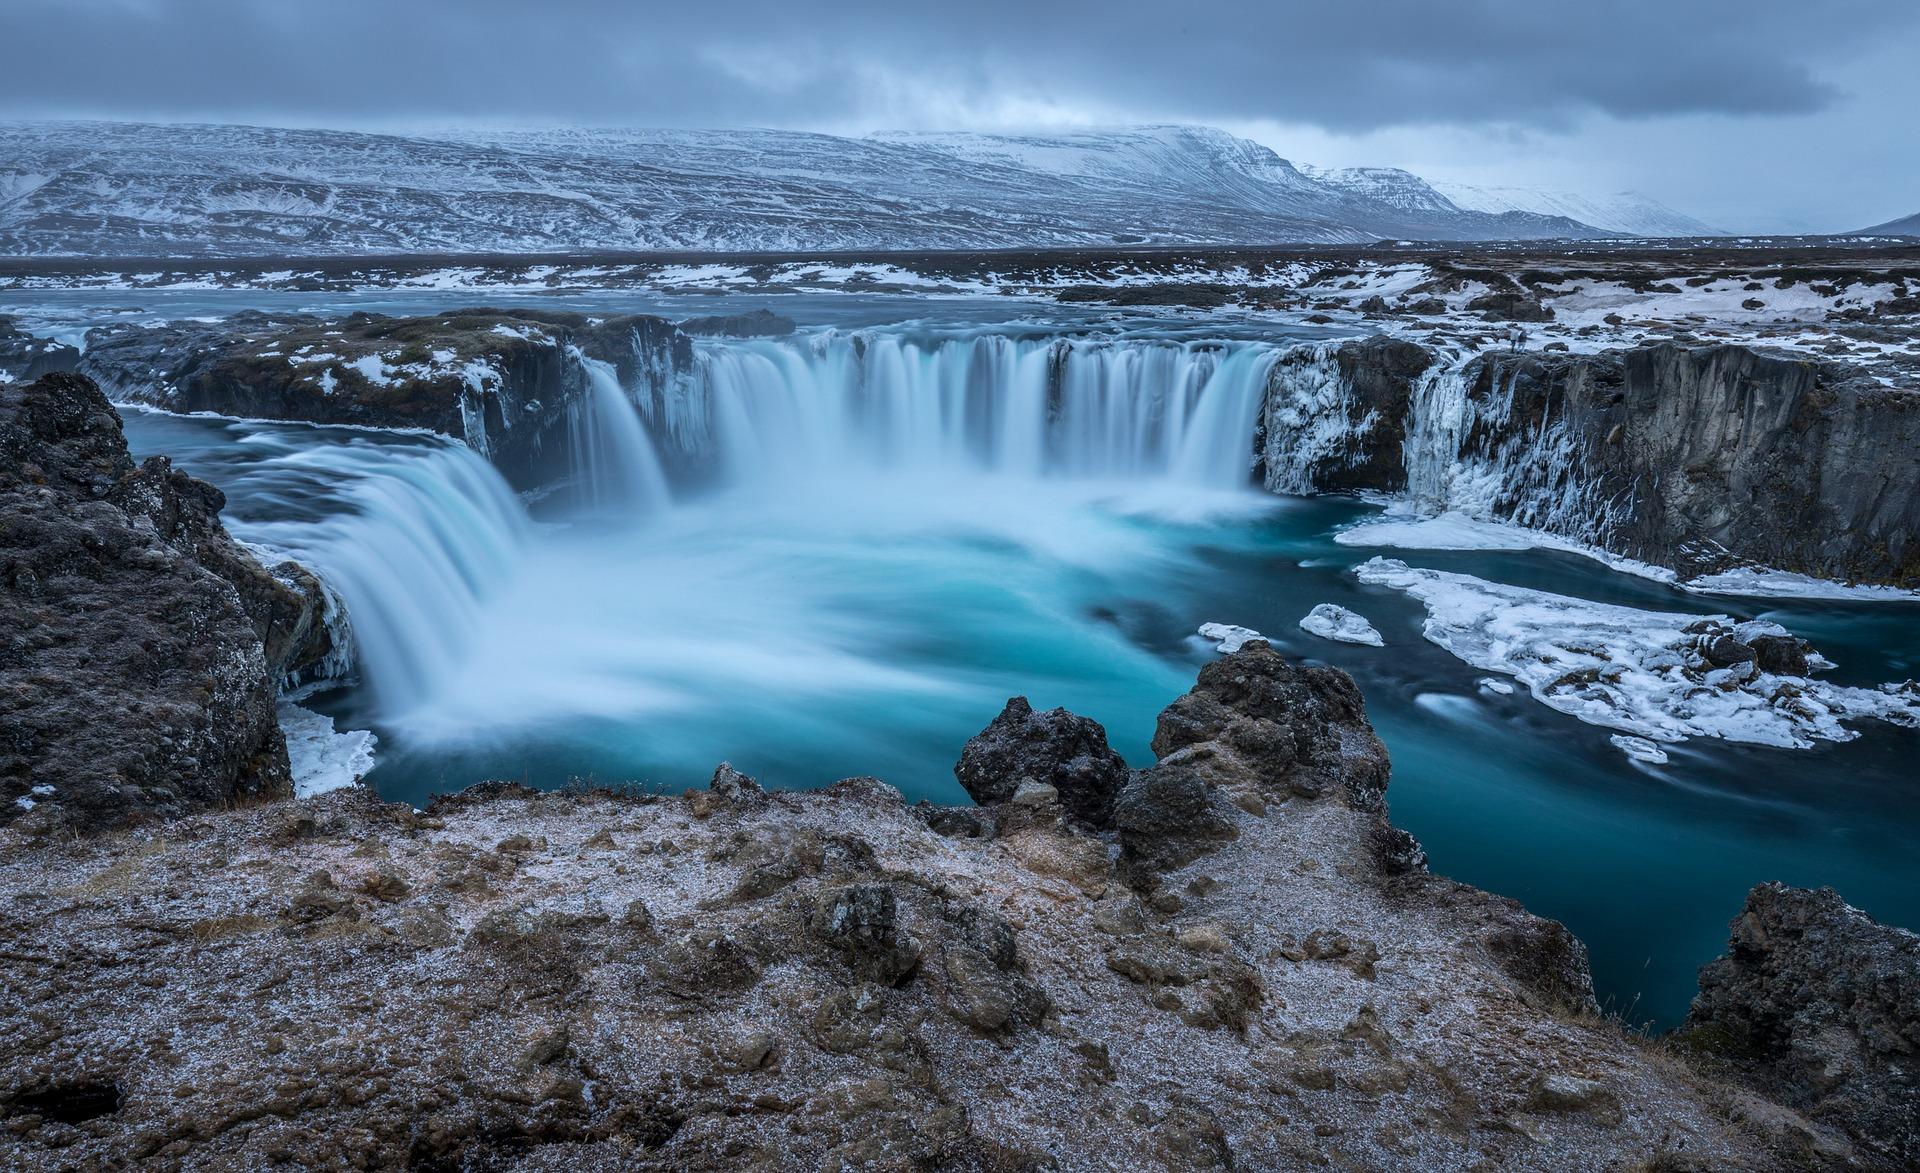 Godafoss,Waterfall Iceland